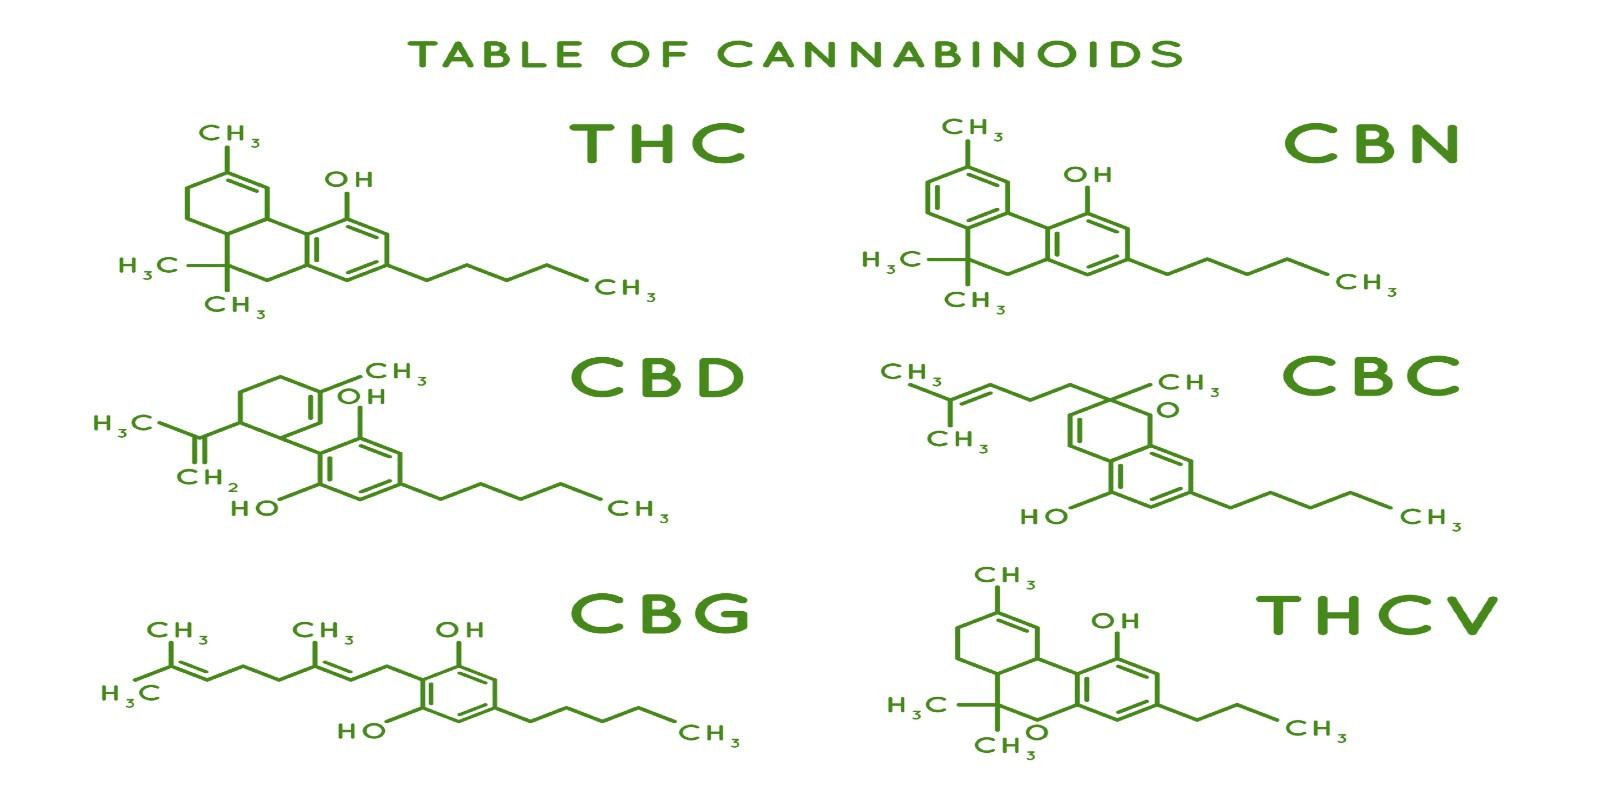 calling hemp flower cannabinoids